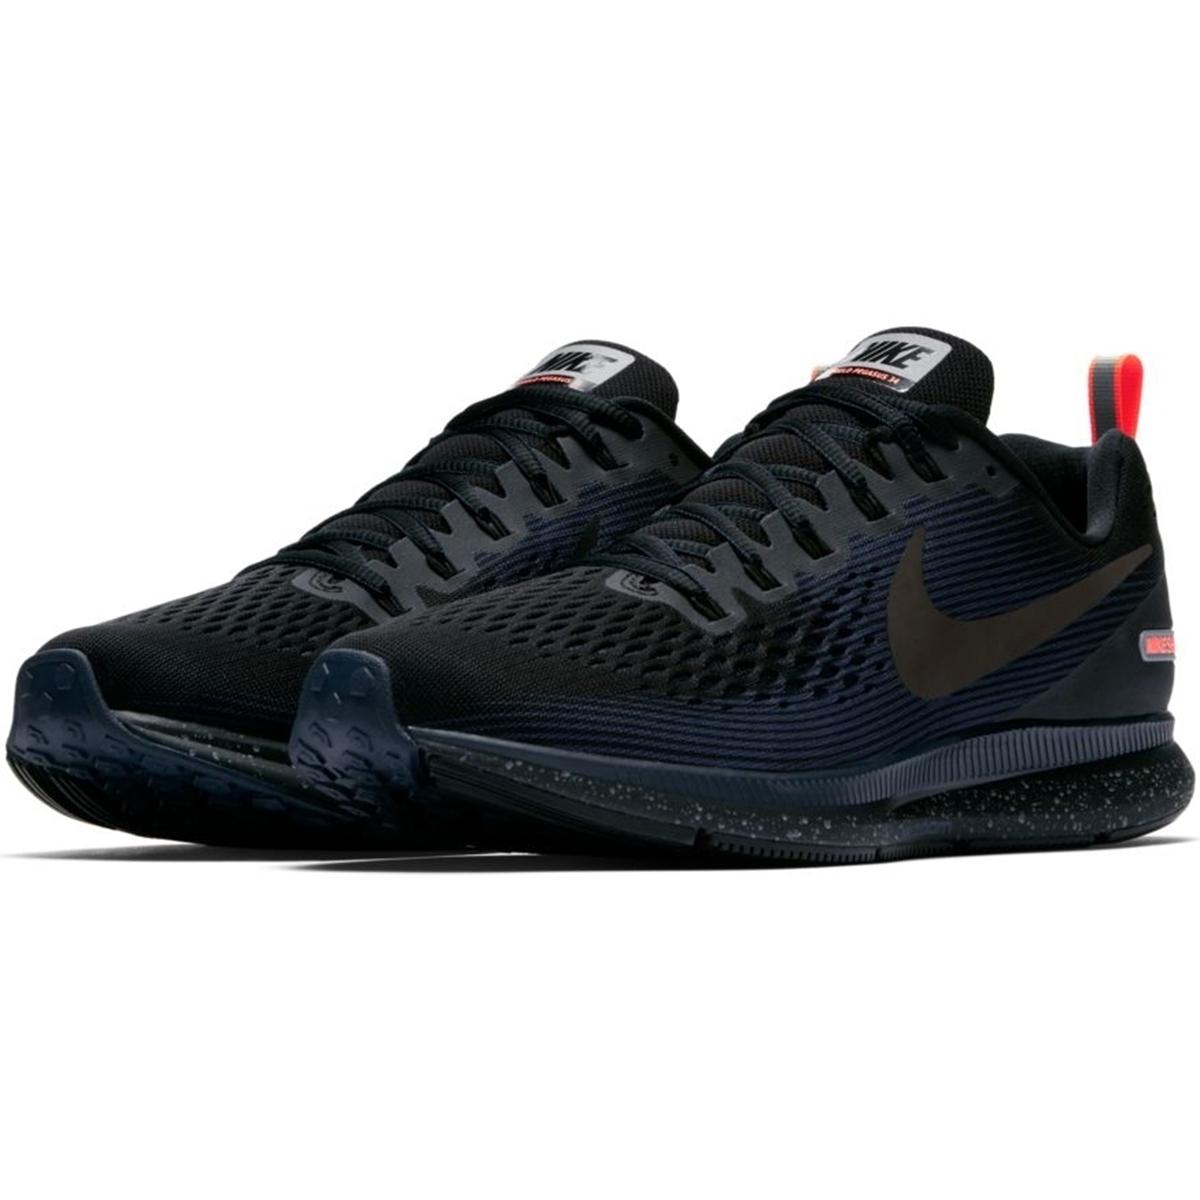 new style bedc3 c487c Bilde av Nike AIR ZOOM PEGASUS 34 SHIELD 907327-001